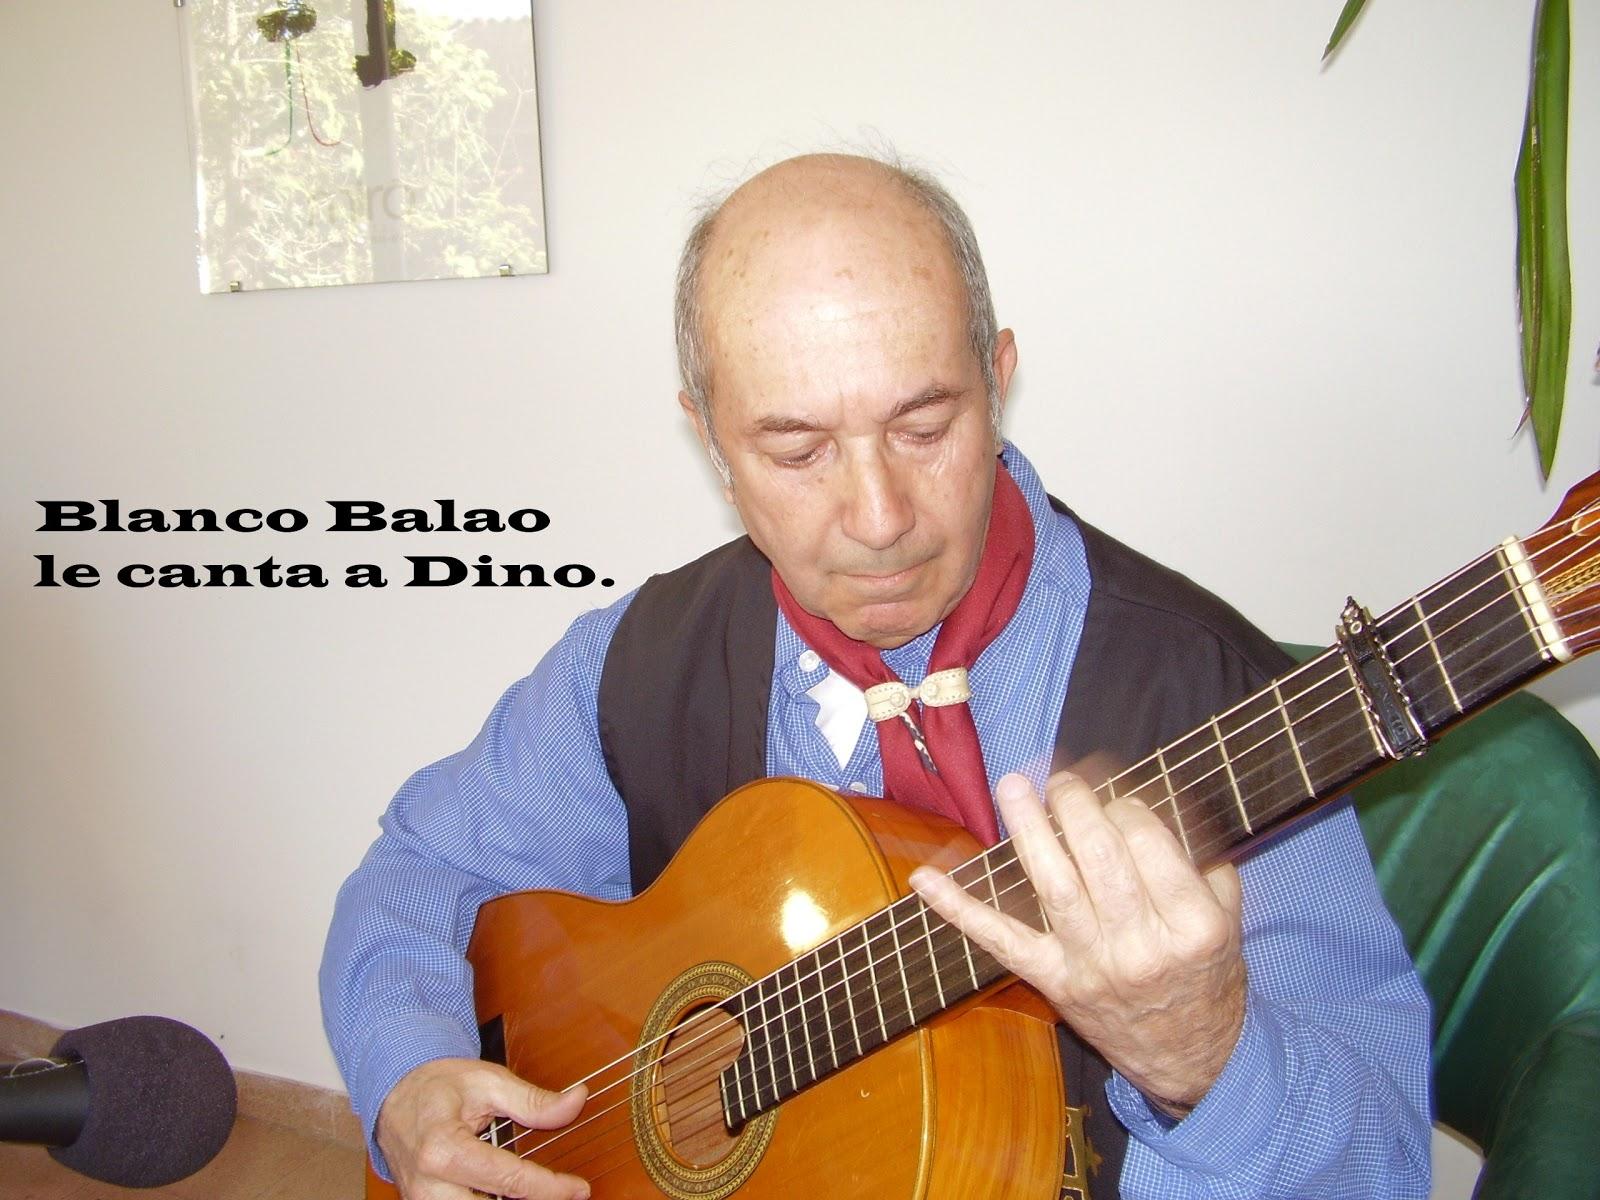 Hegui Muebles Jose Hernandez - El Blog De Juanjo Pereyra[mjhdah]https://4.bp.blogspot.com/-83WH_7f2aCQ/V-QuCjiaN1I/AAAAAAAAVr0/eP2538TPFus_f7tqPJ5zW3icjaibW_9rgCLcB/s1600/jULIO.JPG